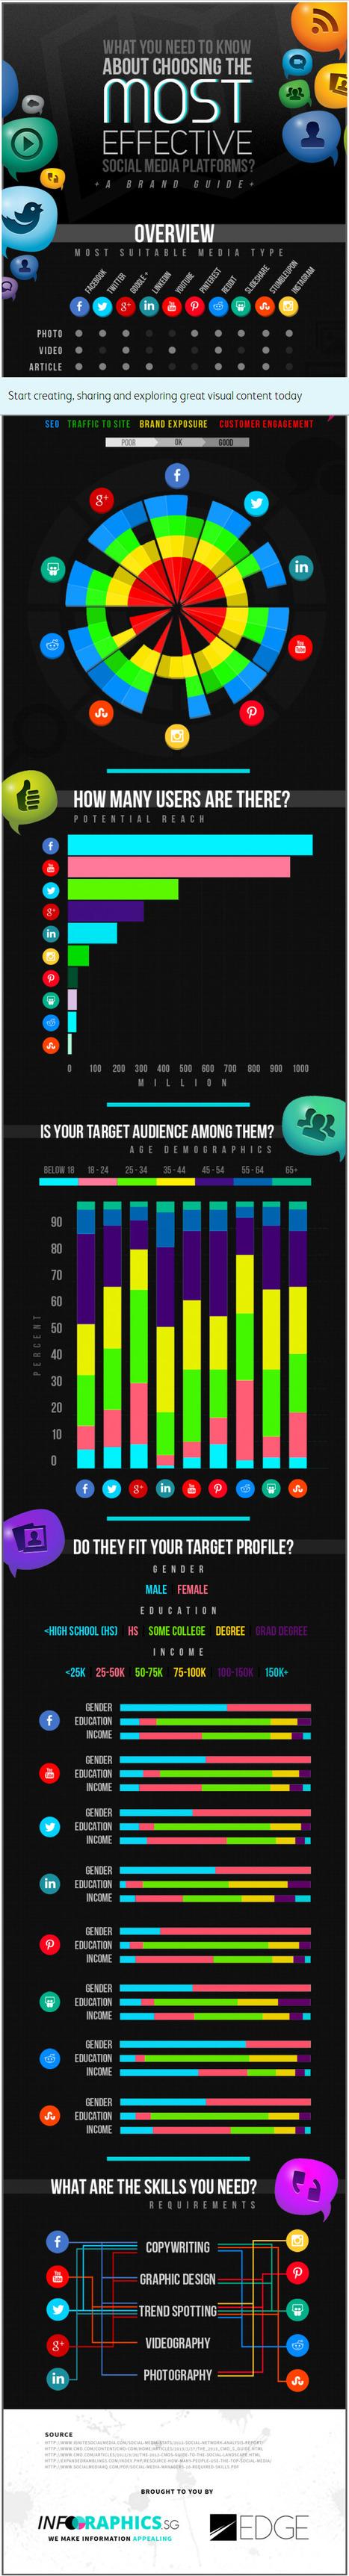 Choosing the most effective social media platforms [Infographie] | Imagincreagraph.com | Scoop.it